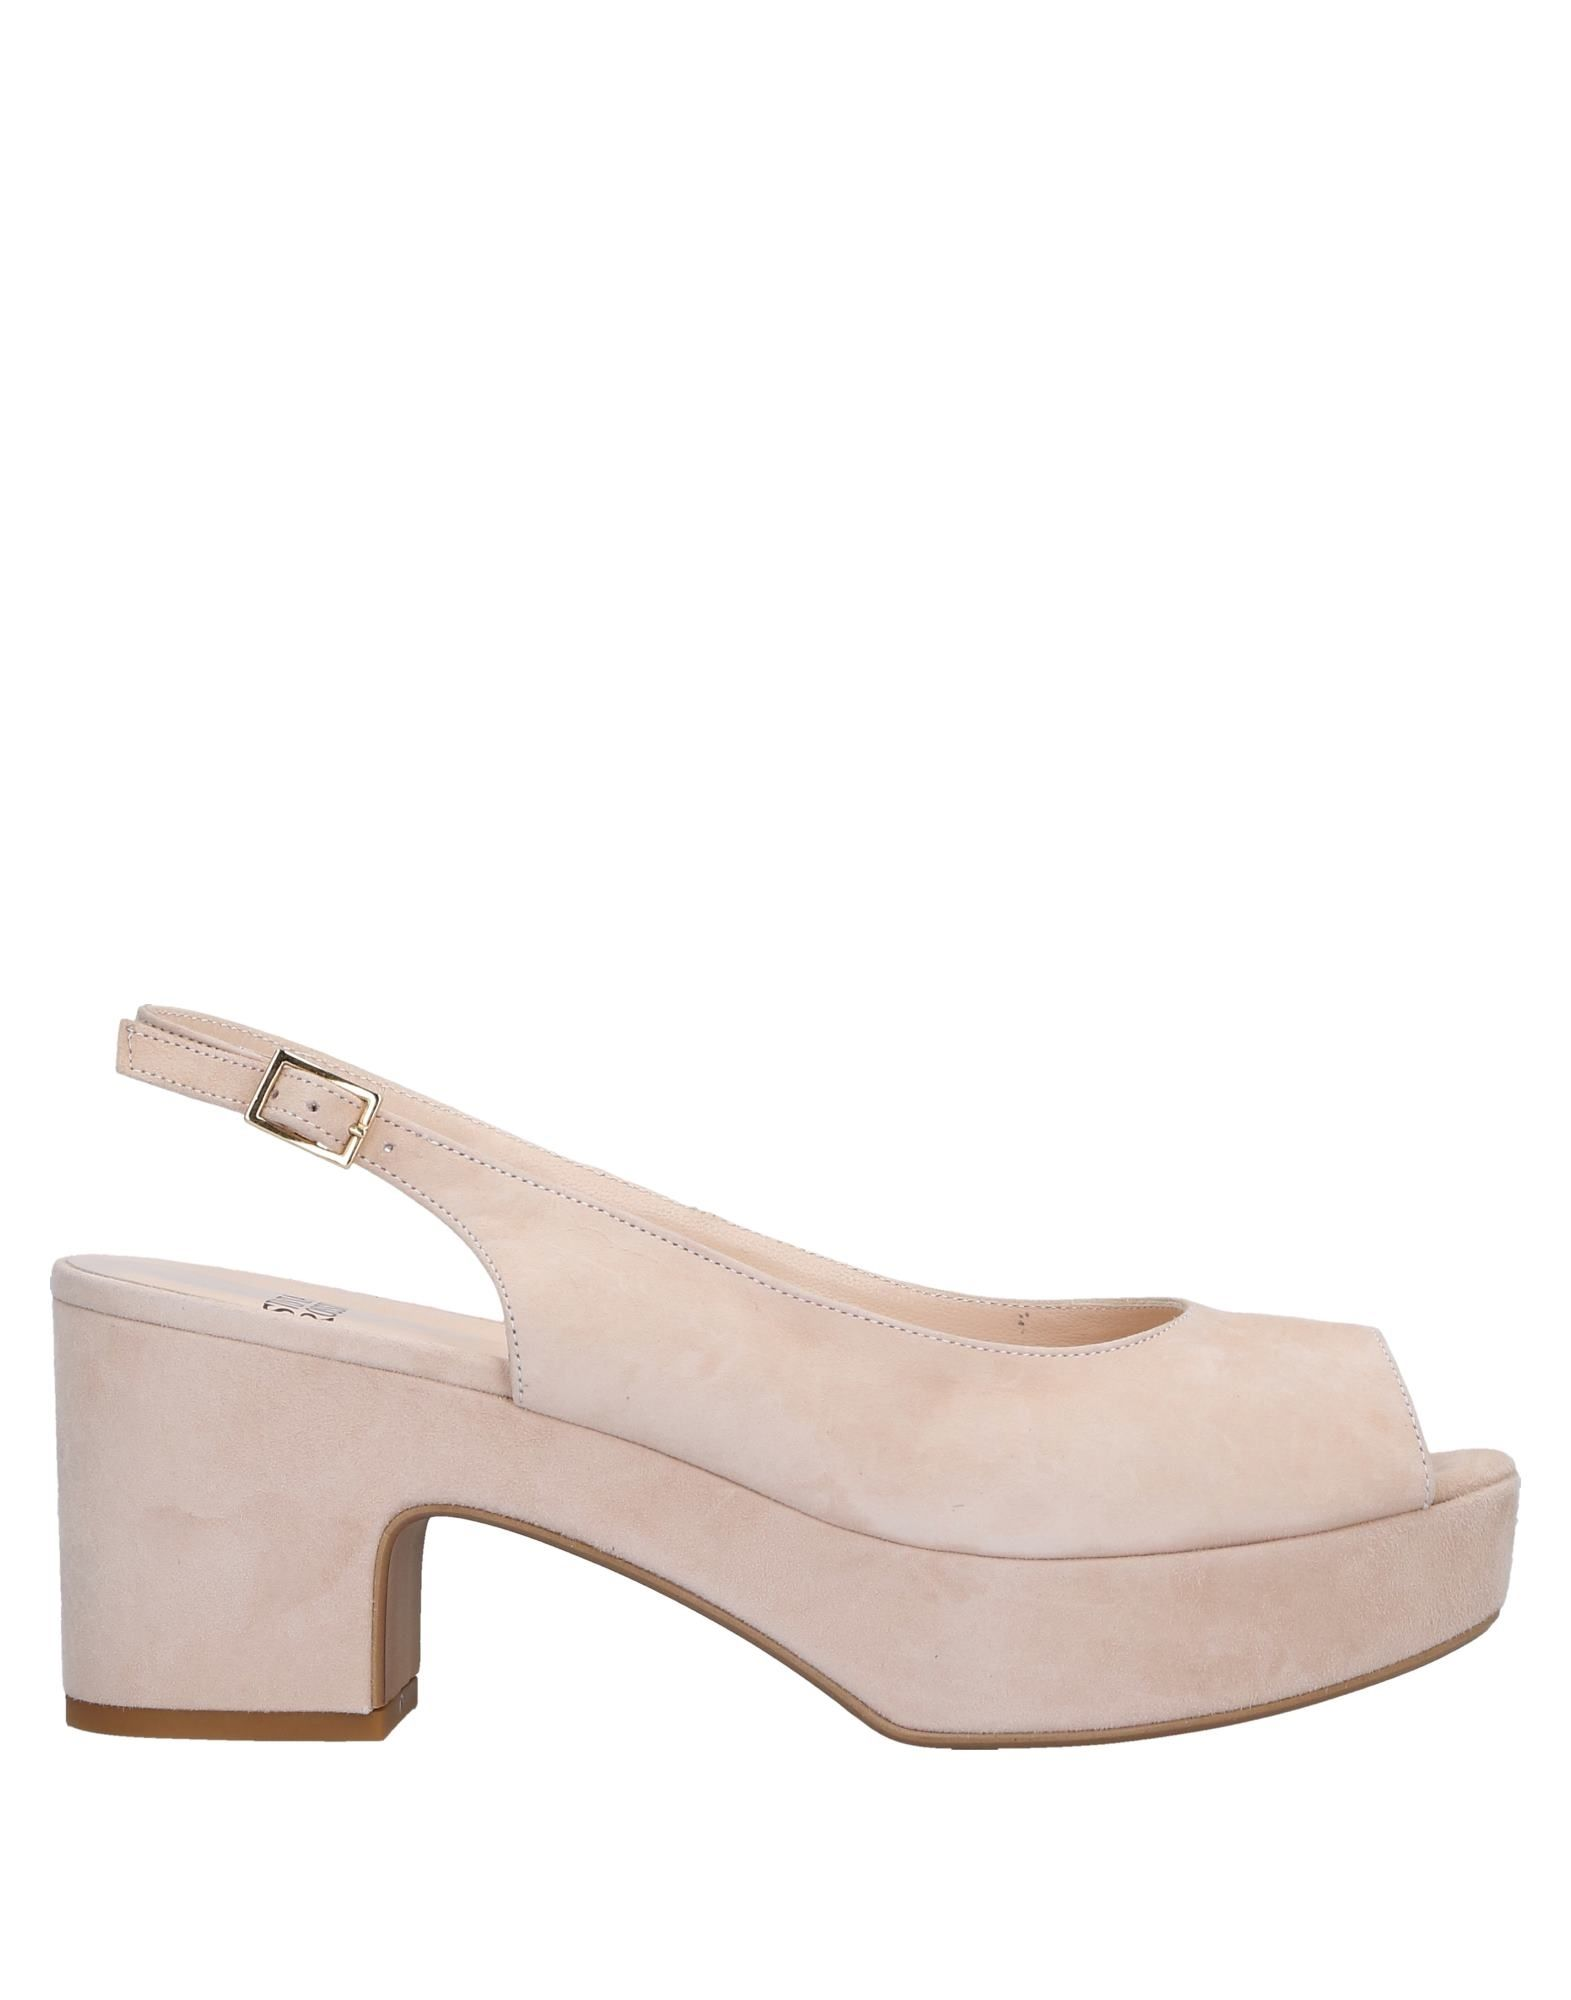 Silvia Rossini Sandalen Damen  11533377EB Gute Qualität beliebte Schuhe